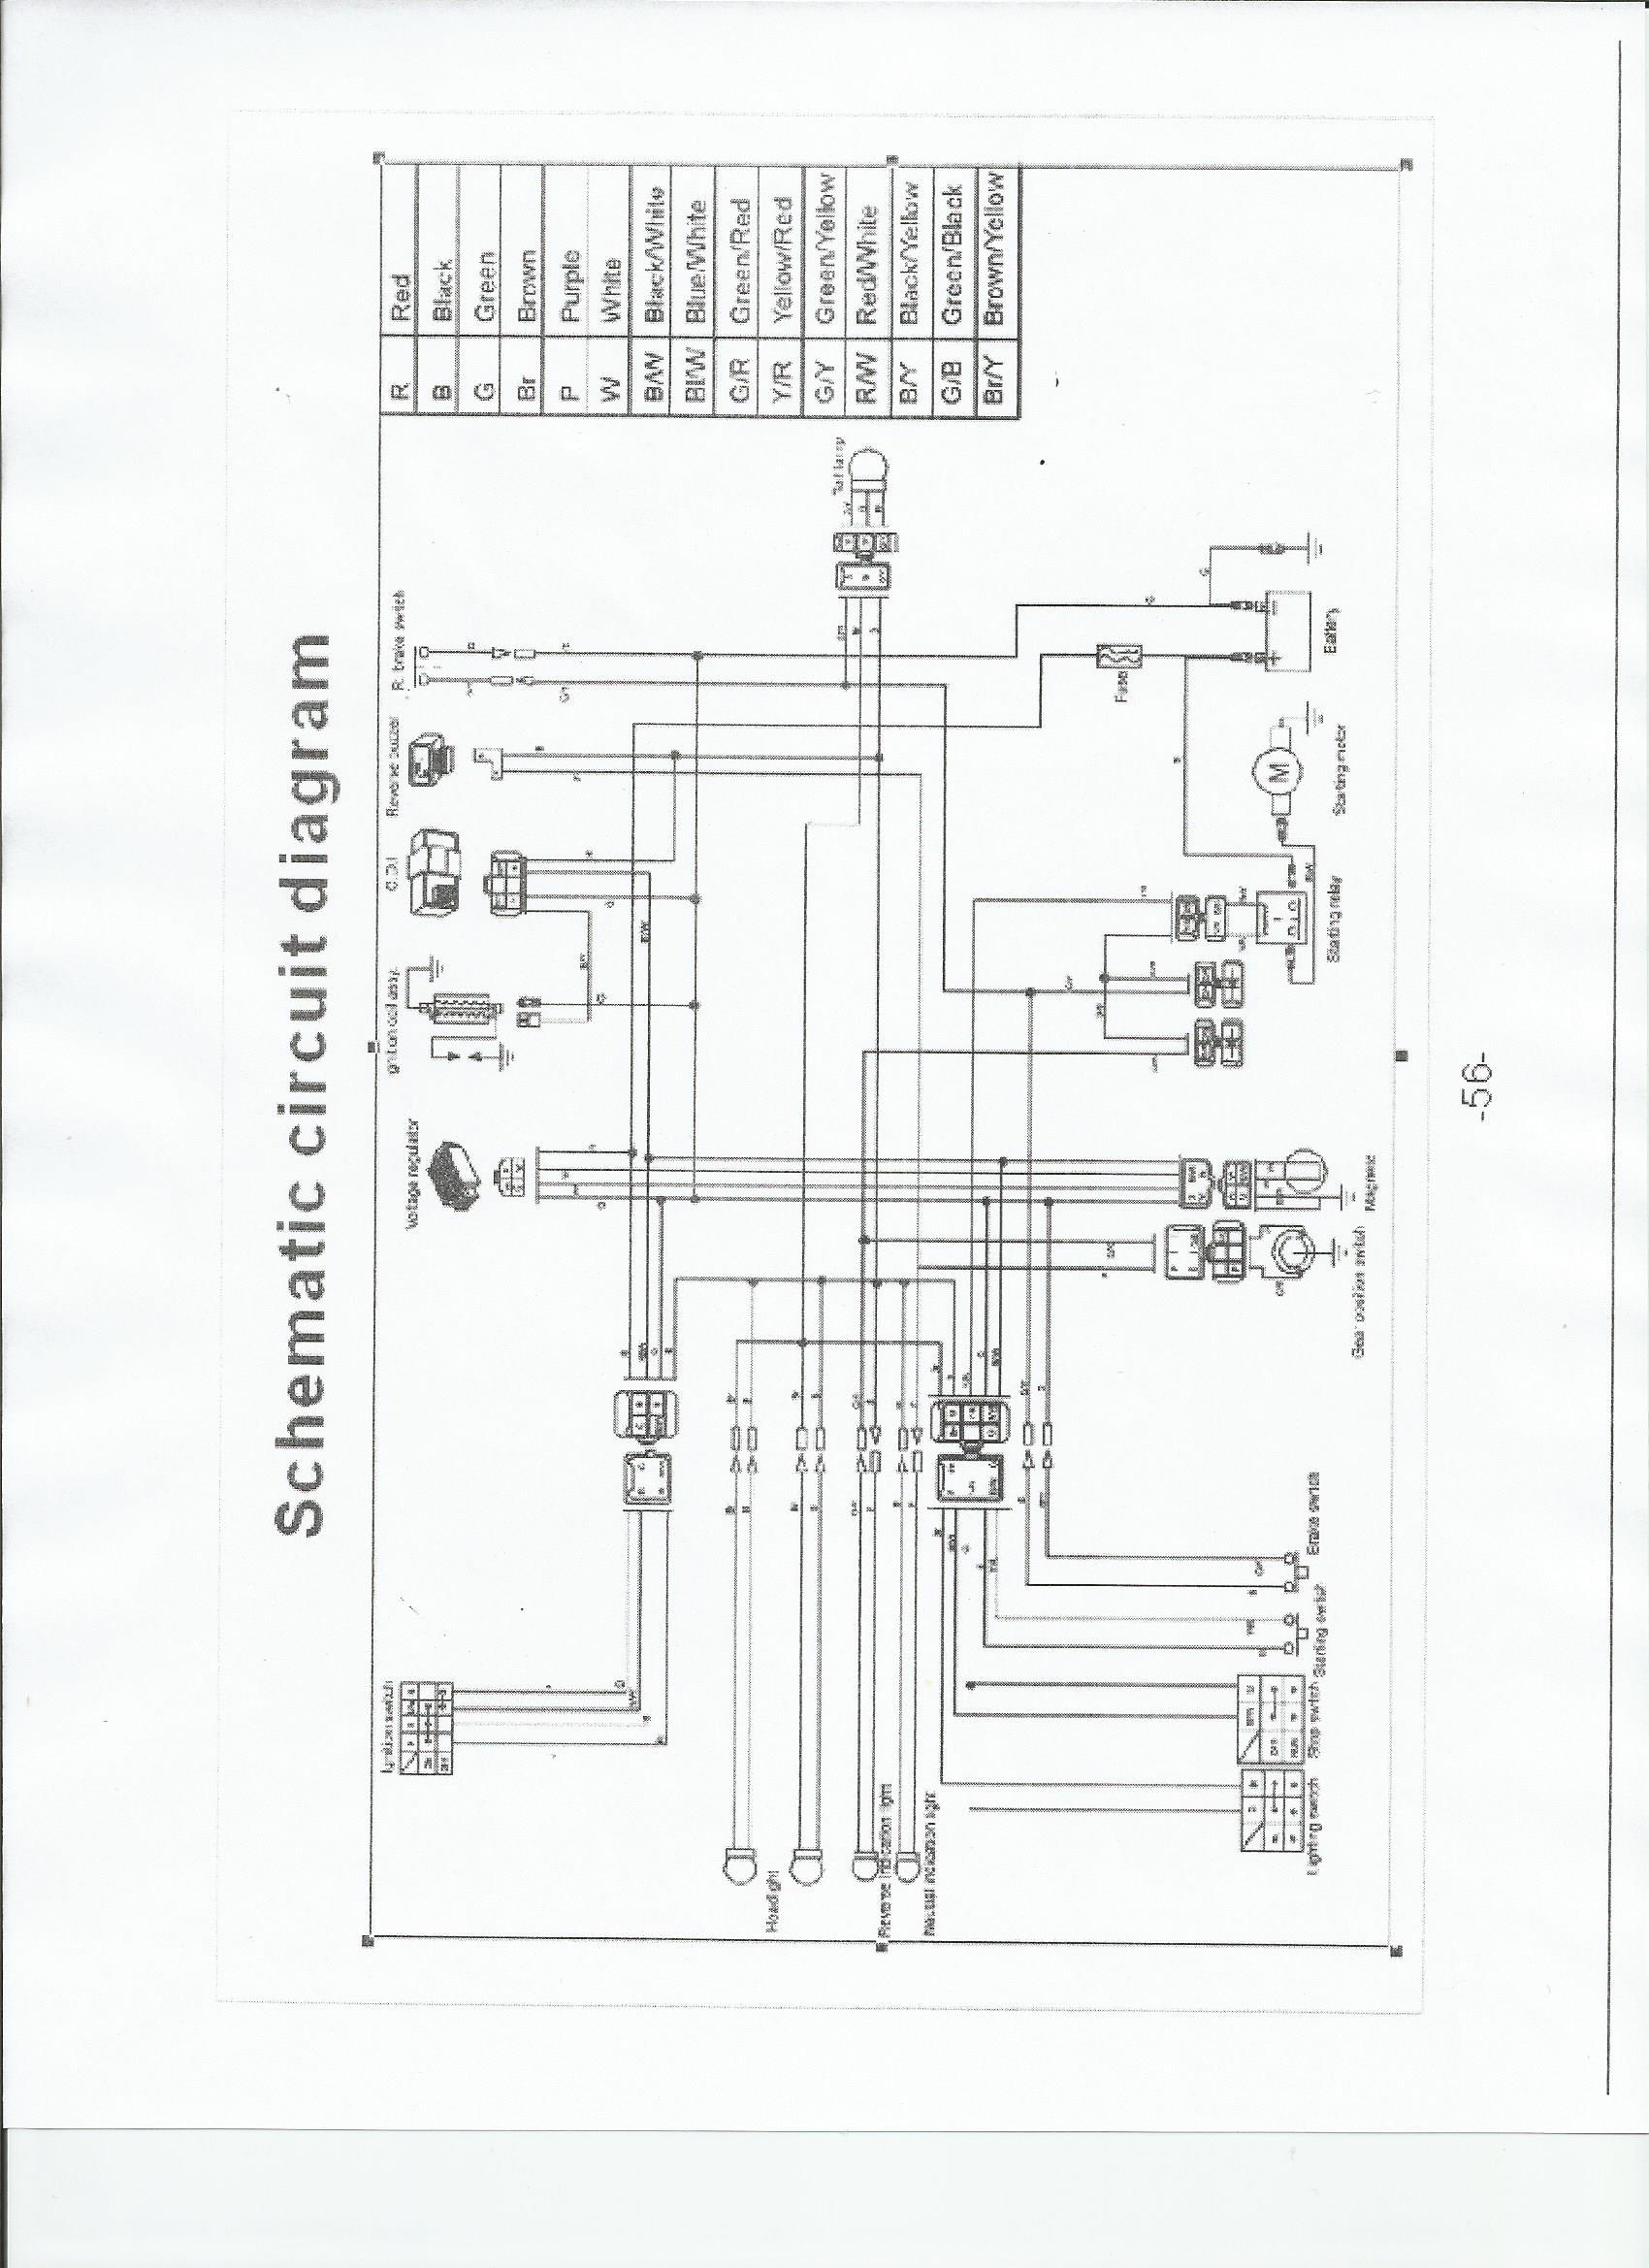 90cc Quad Wiring Diagram Electrical Diagrams Wildfire Atv Schematic Snowmobile